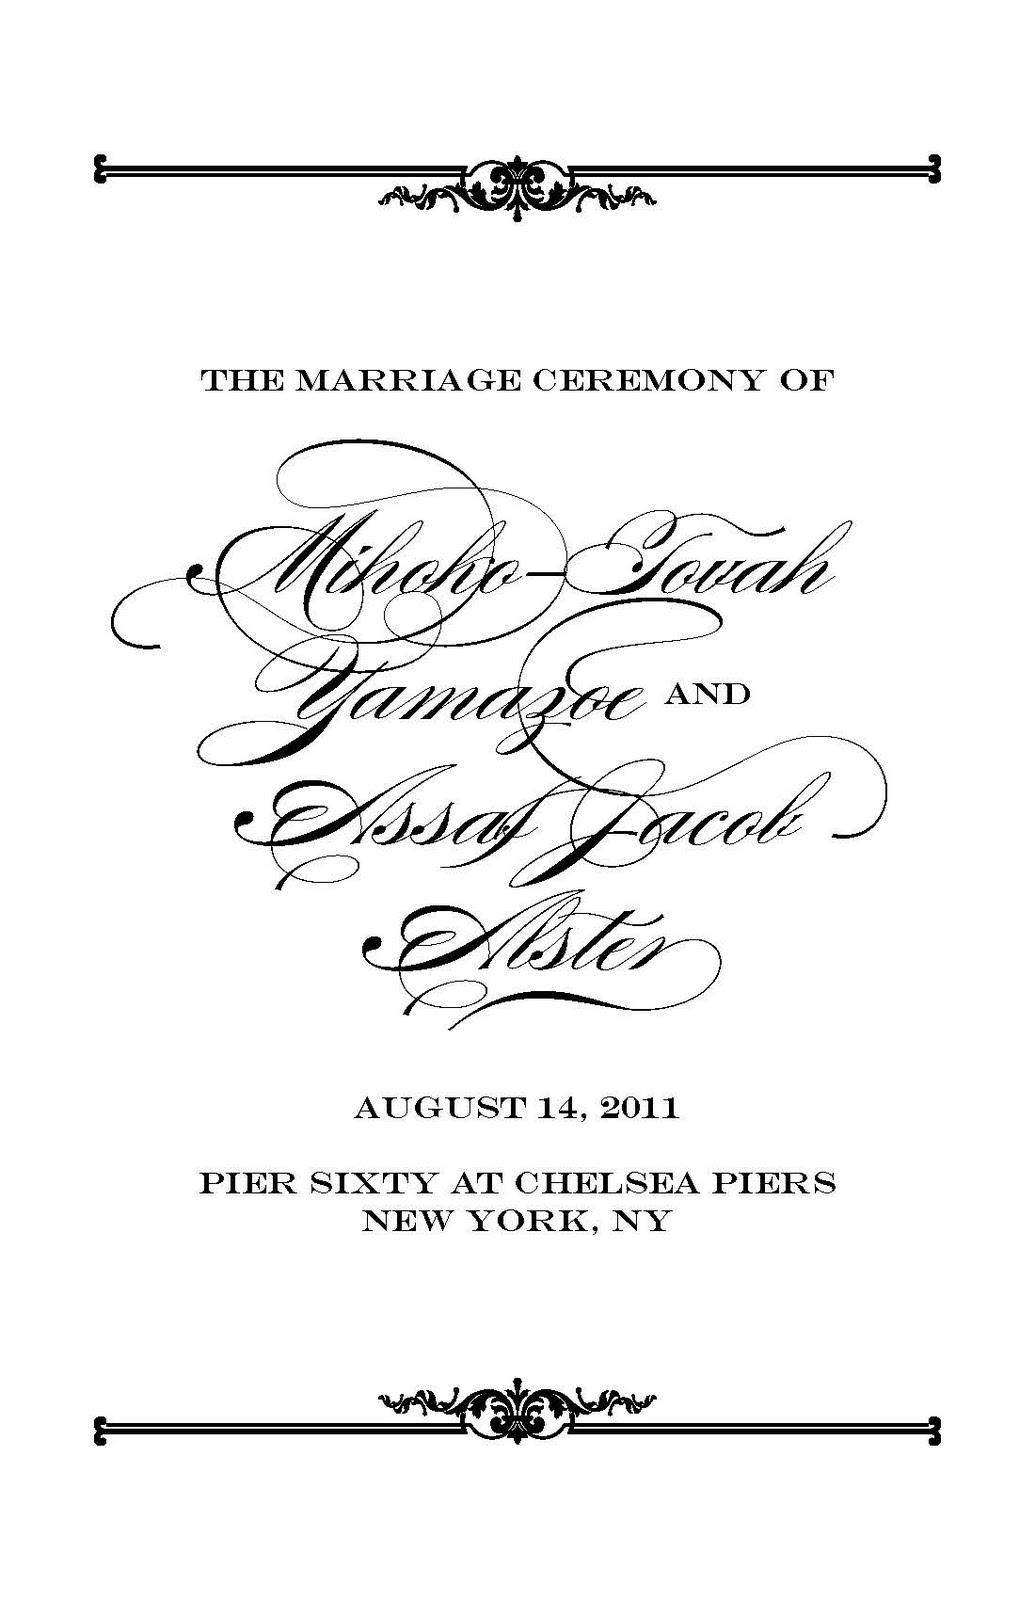 Custom Printables: Mihoko and Assaf's Wedding Program